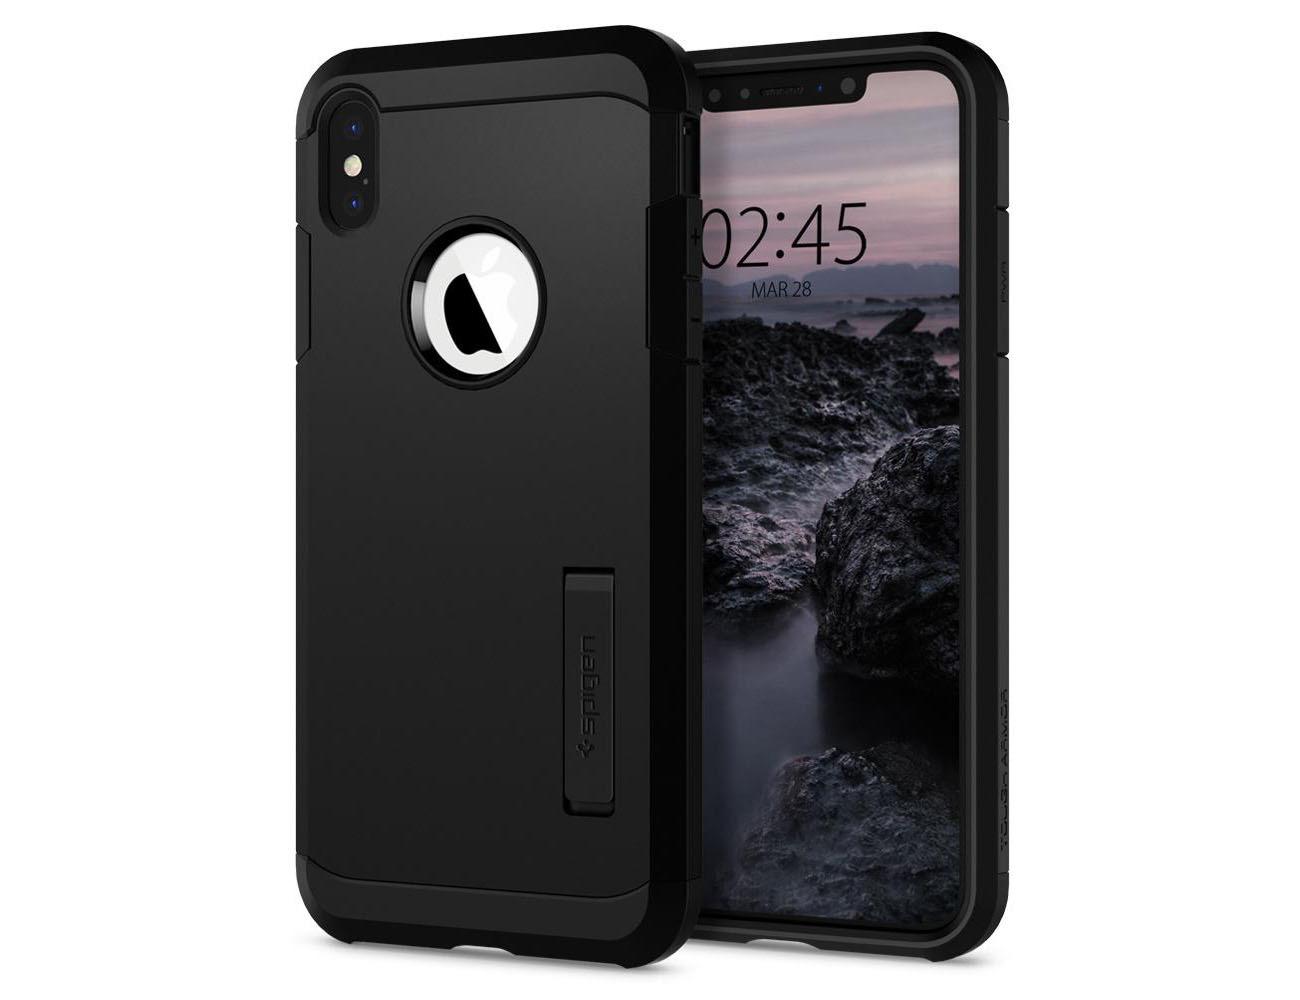 Spigen Apple iPhone 2018 case